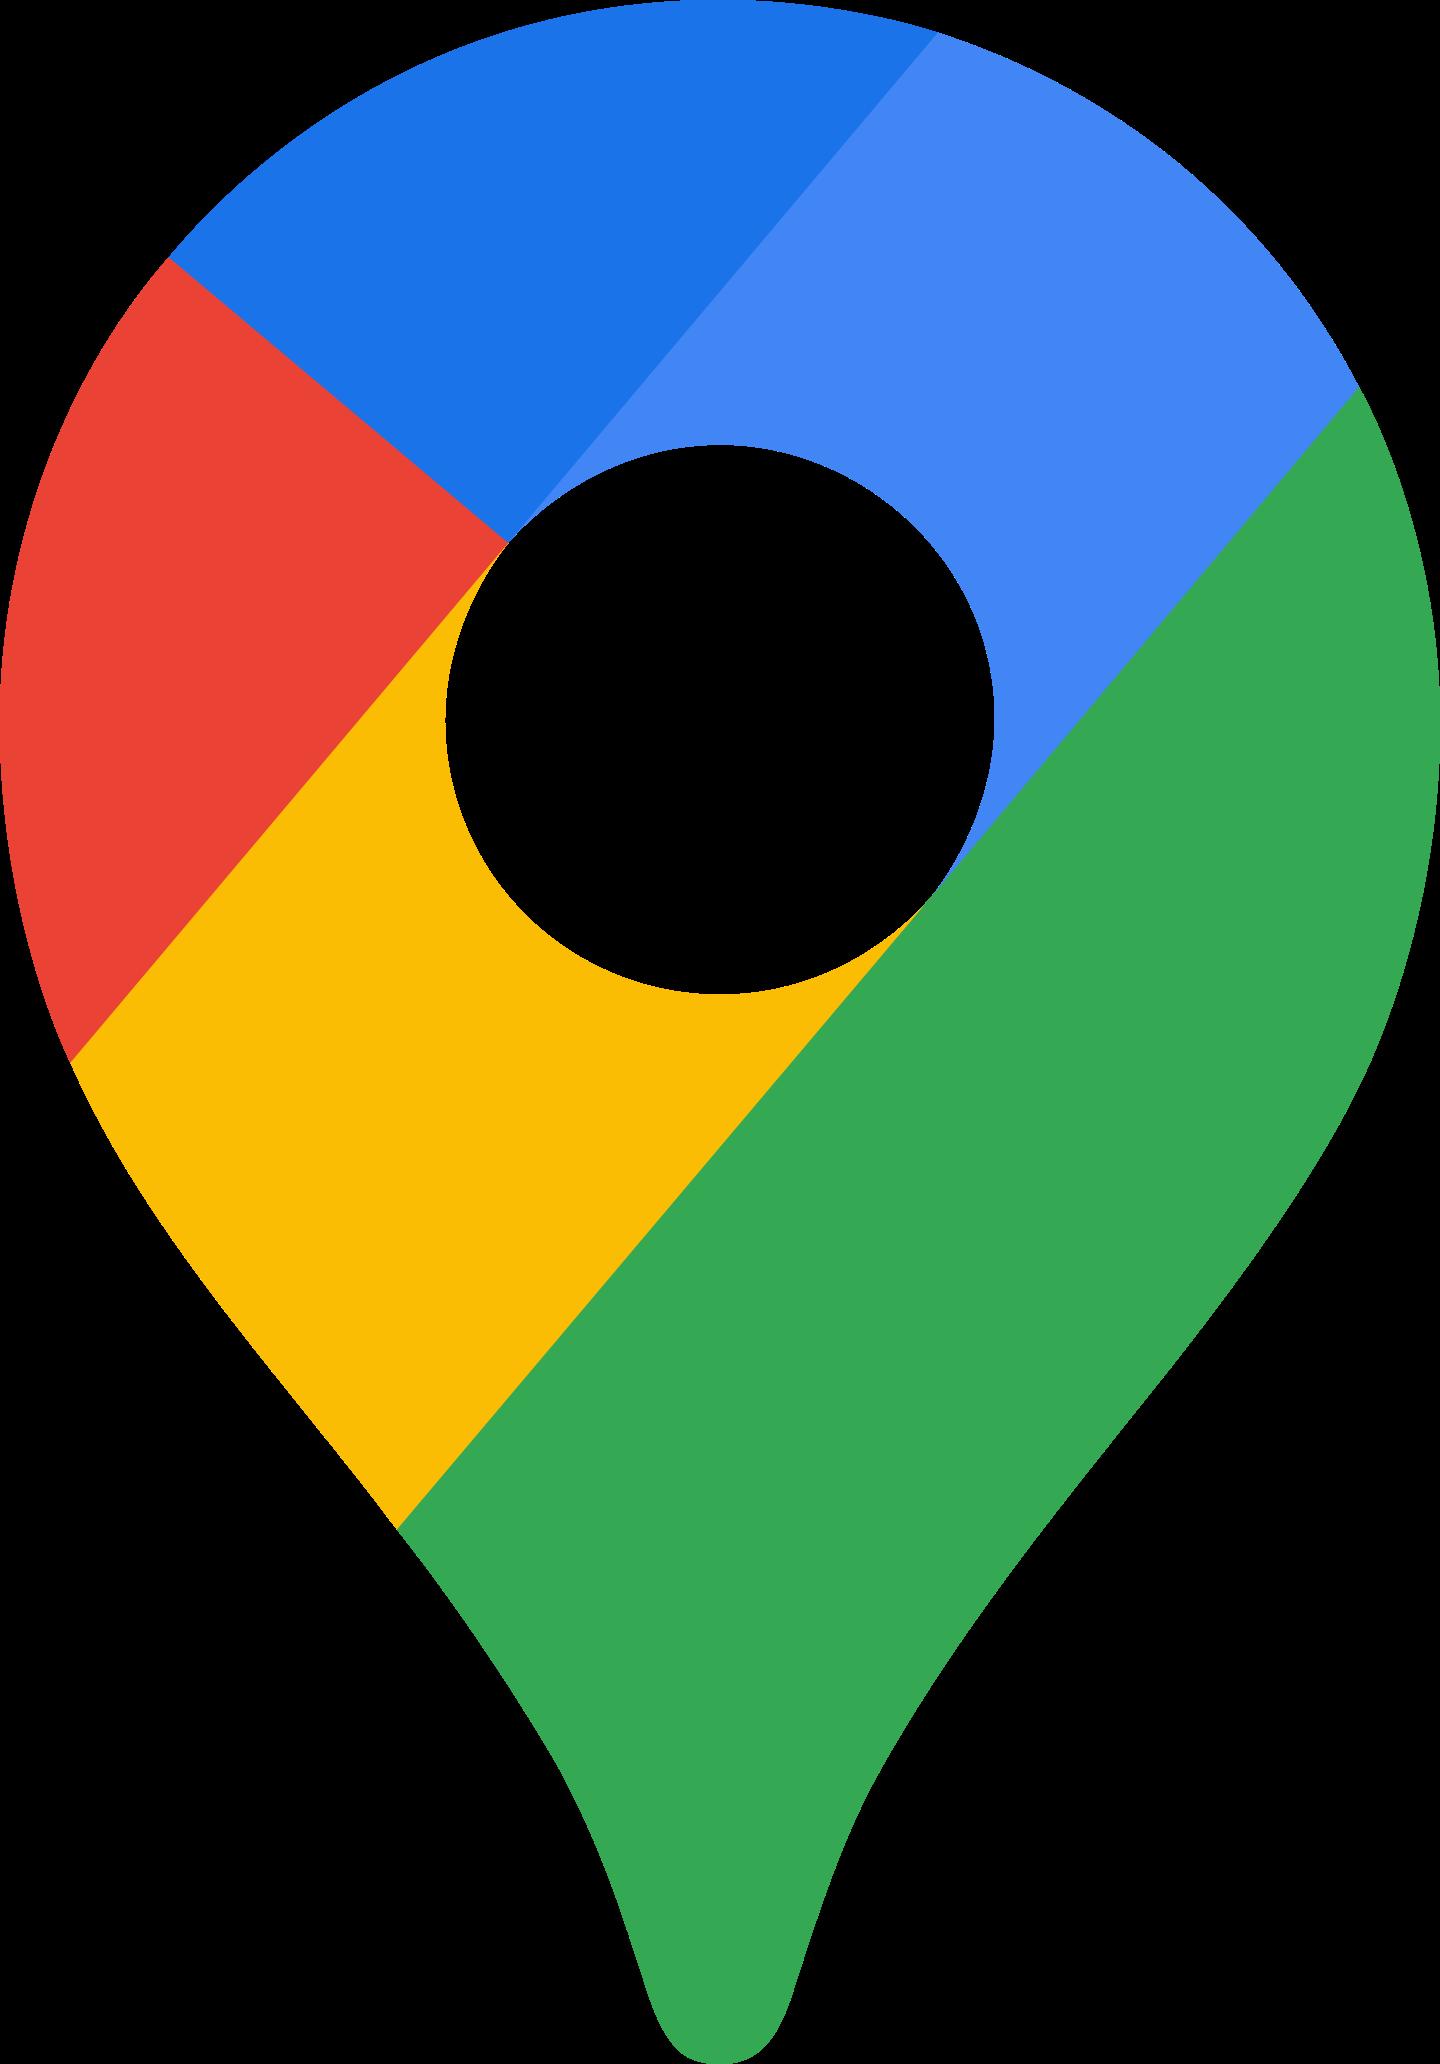 google maps logo 4 1 - Google Maps Logo